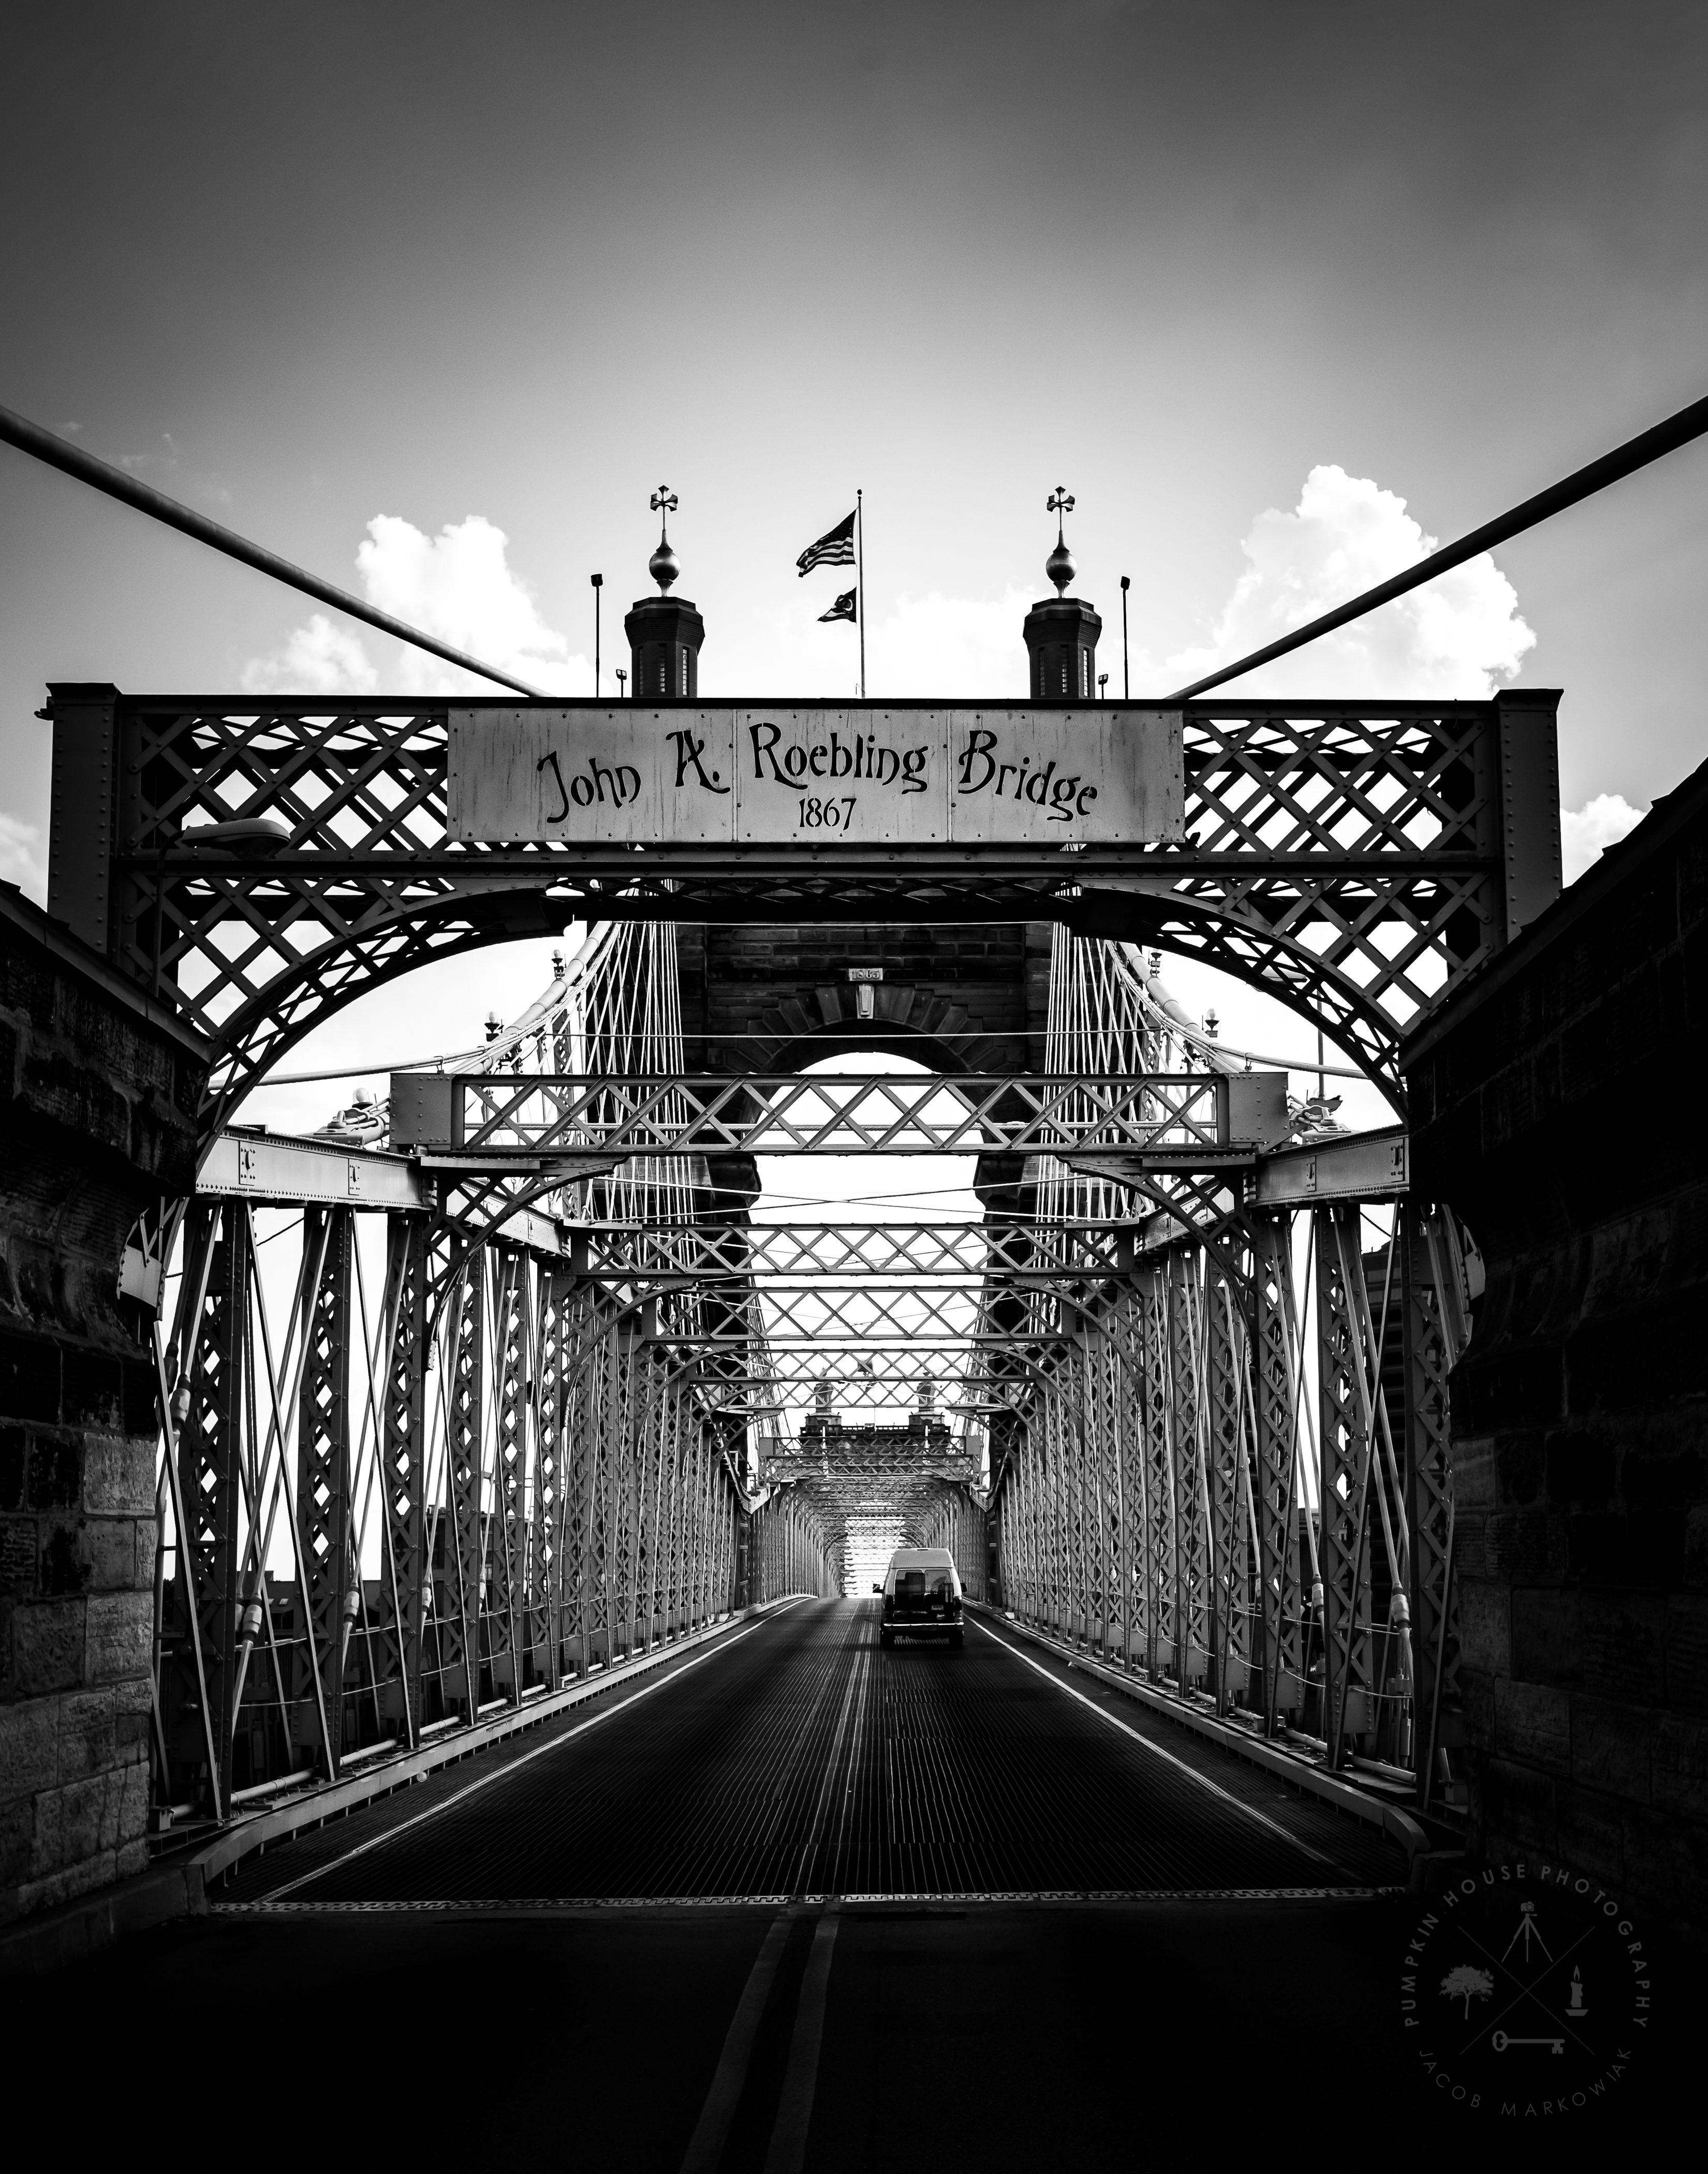 the Roebling_pH